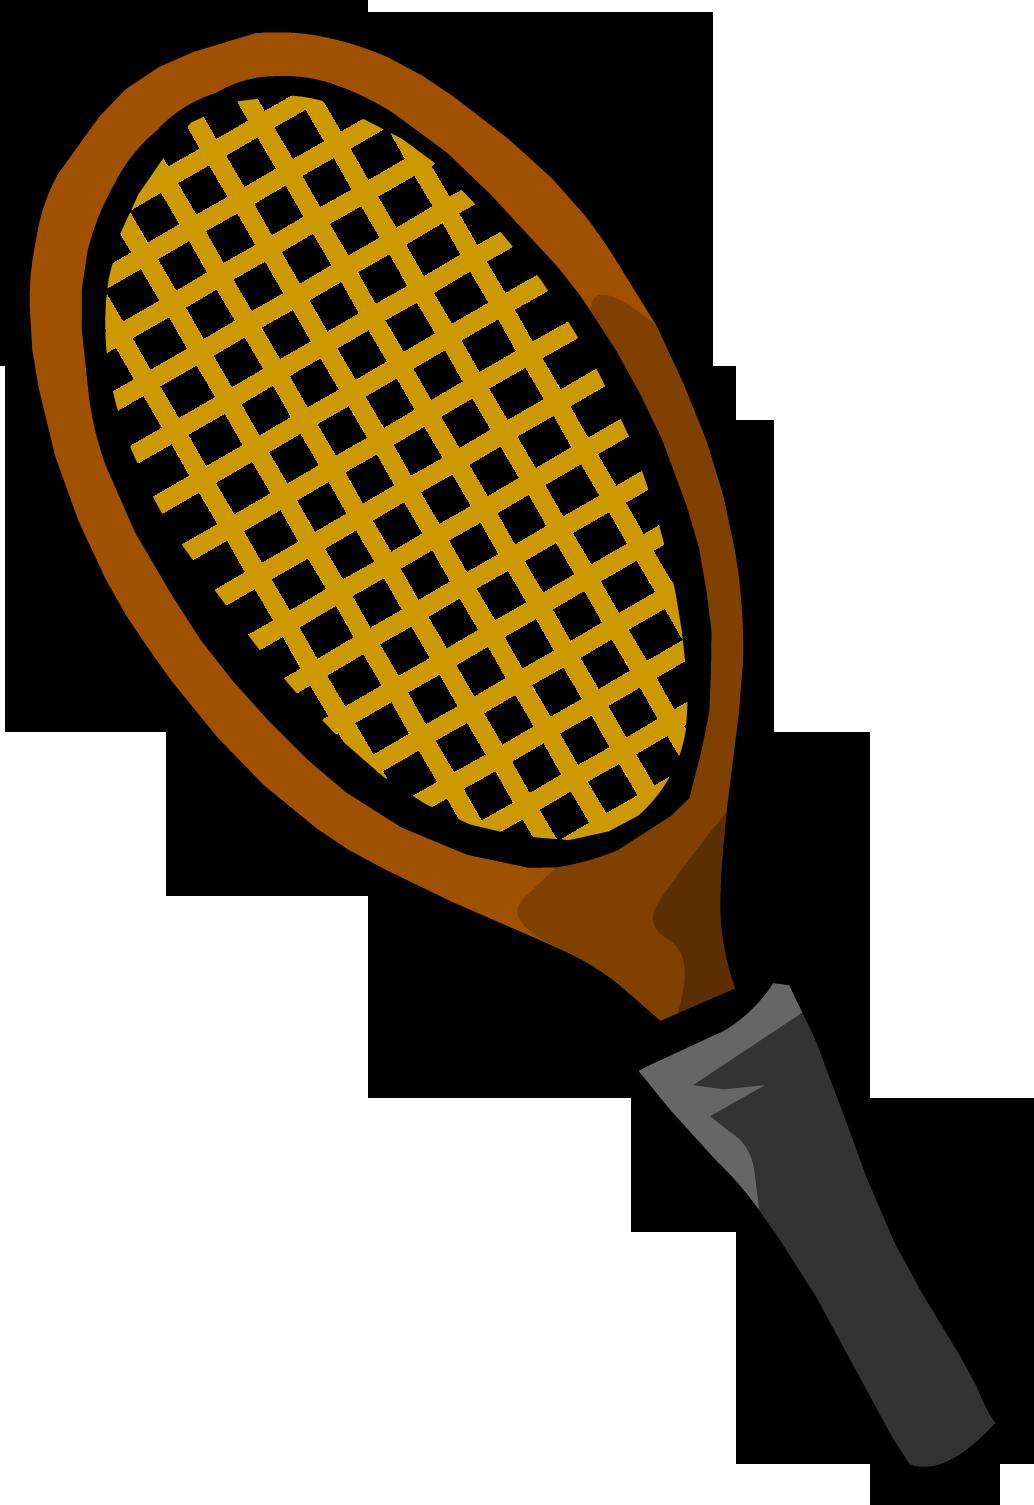 tennis racket club penguin wiki fandom powered by wikia rh clubpenguin wikia com Crossed Tennis Rackets Clip Art Female Tennis Clip Art